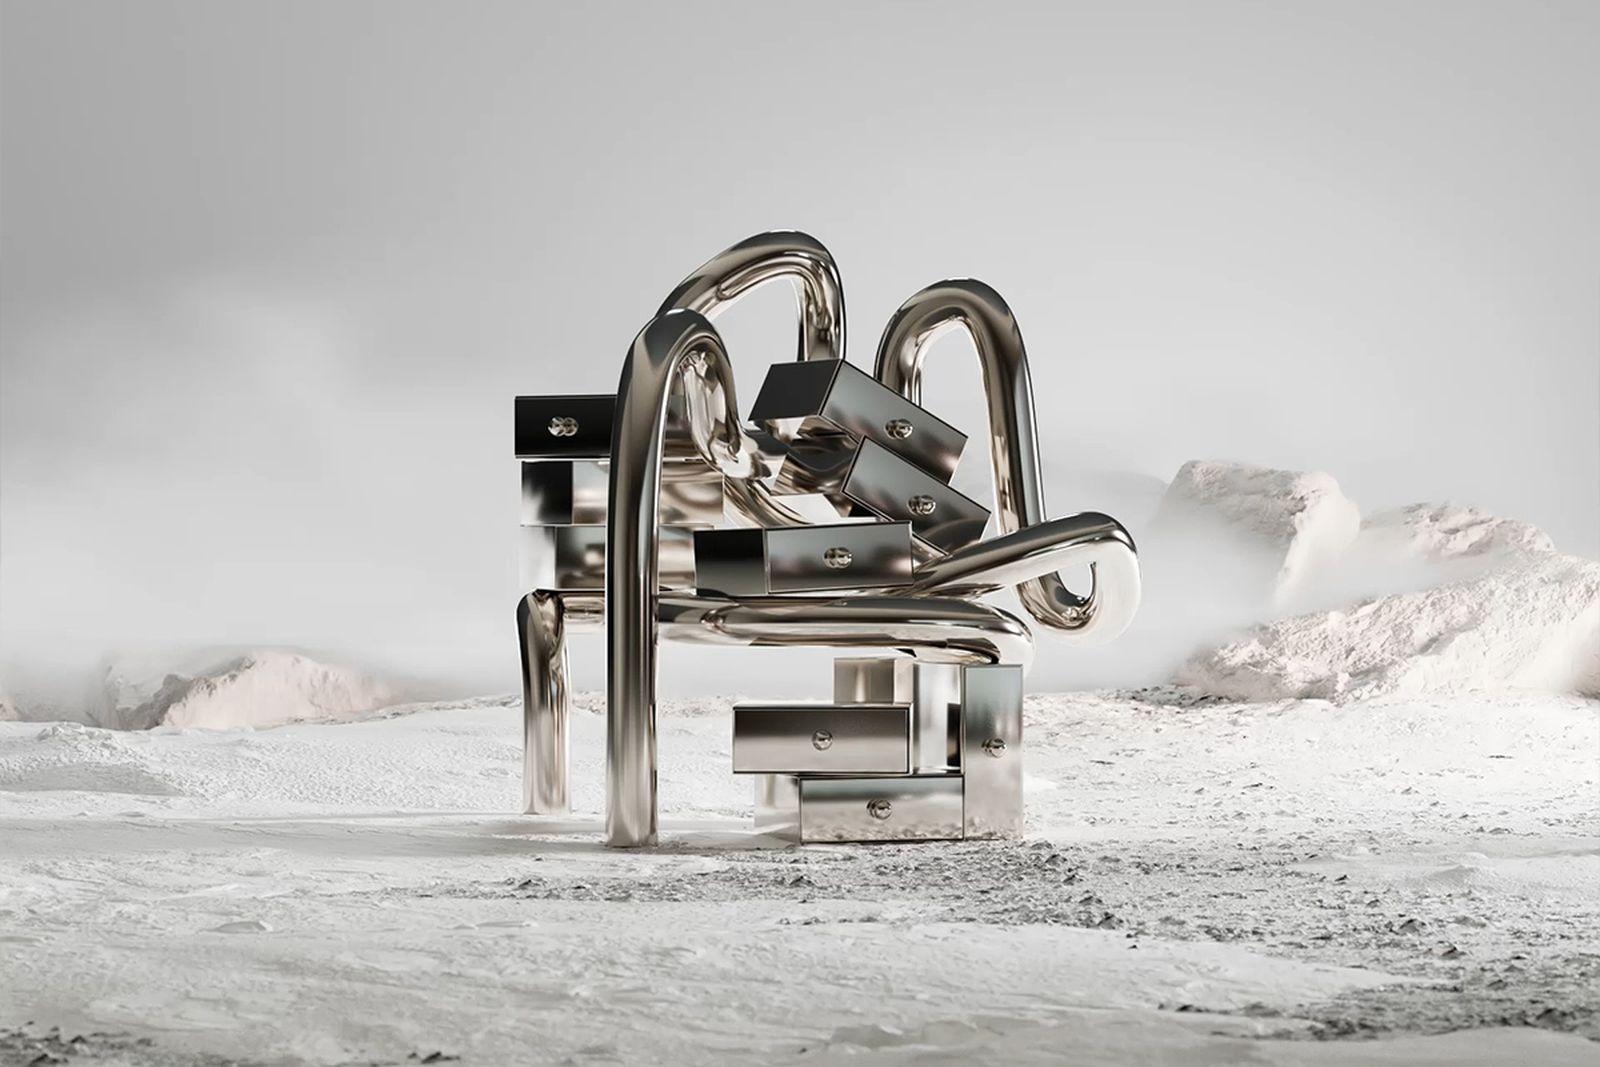 andres-reisinger-the-shipping-digital-furniture-auction-02